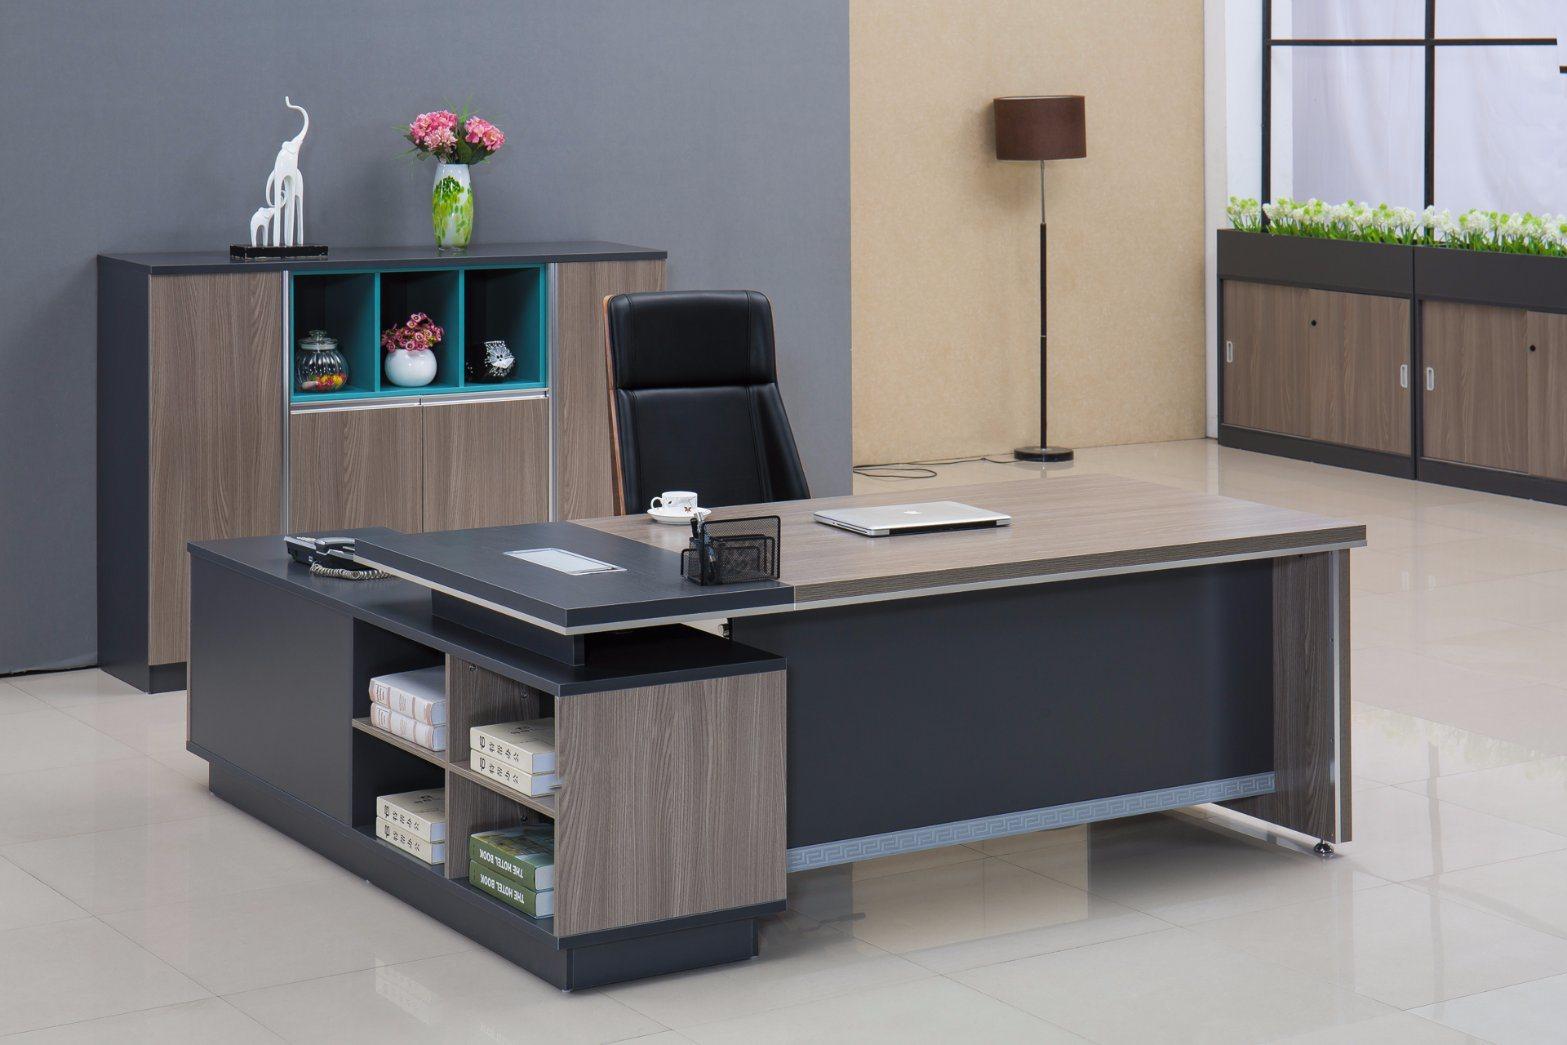 boss tableoffice deskexecutive deskmanager. New Product Melamine Manager Senior Executive Boss Office Laptop Table Tableoffice Deskexecutive Deskmanager E